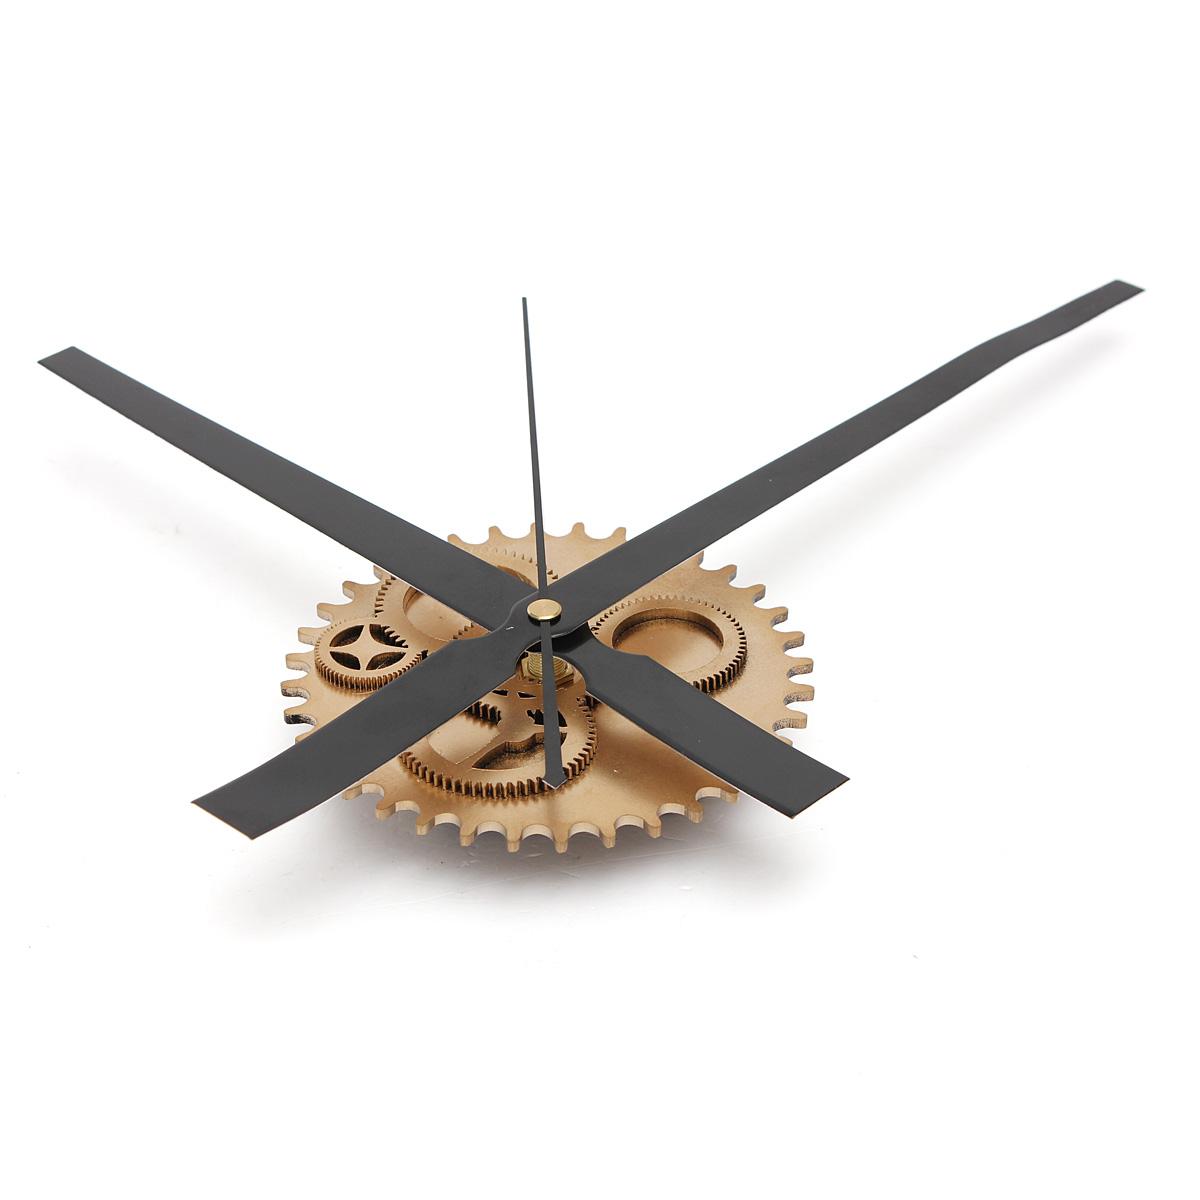 Vintage DIY Mechanism Retro Gear Large Wall Clock Wood